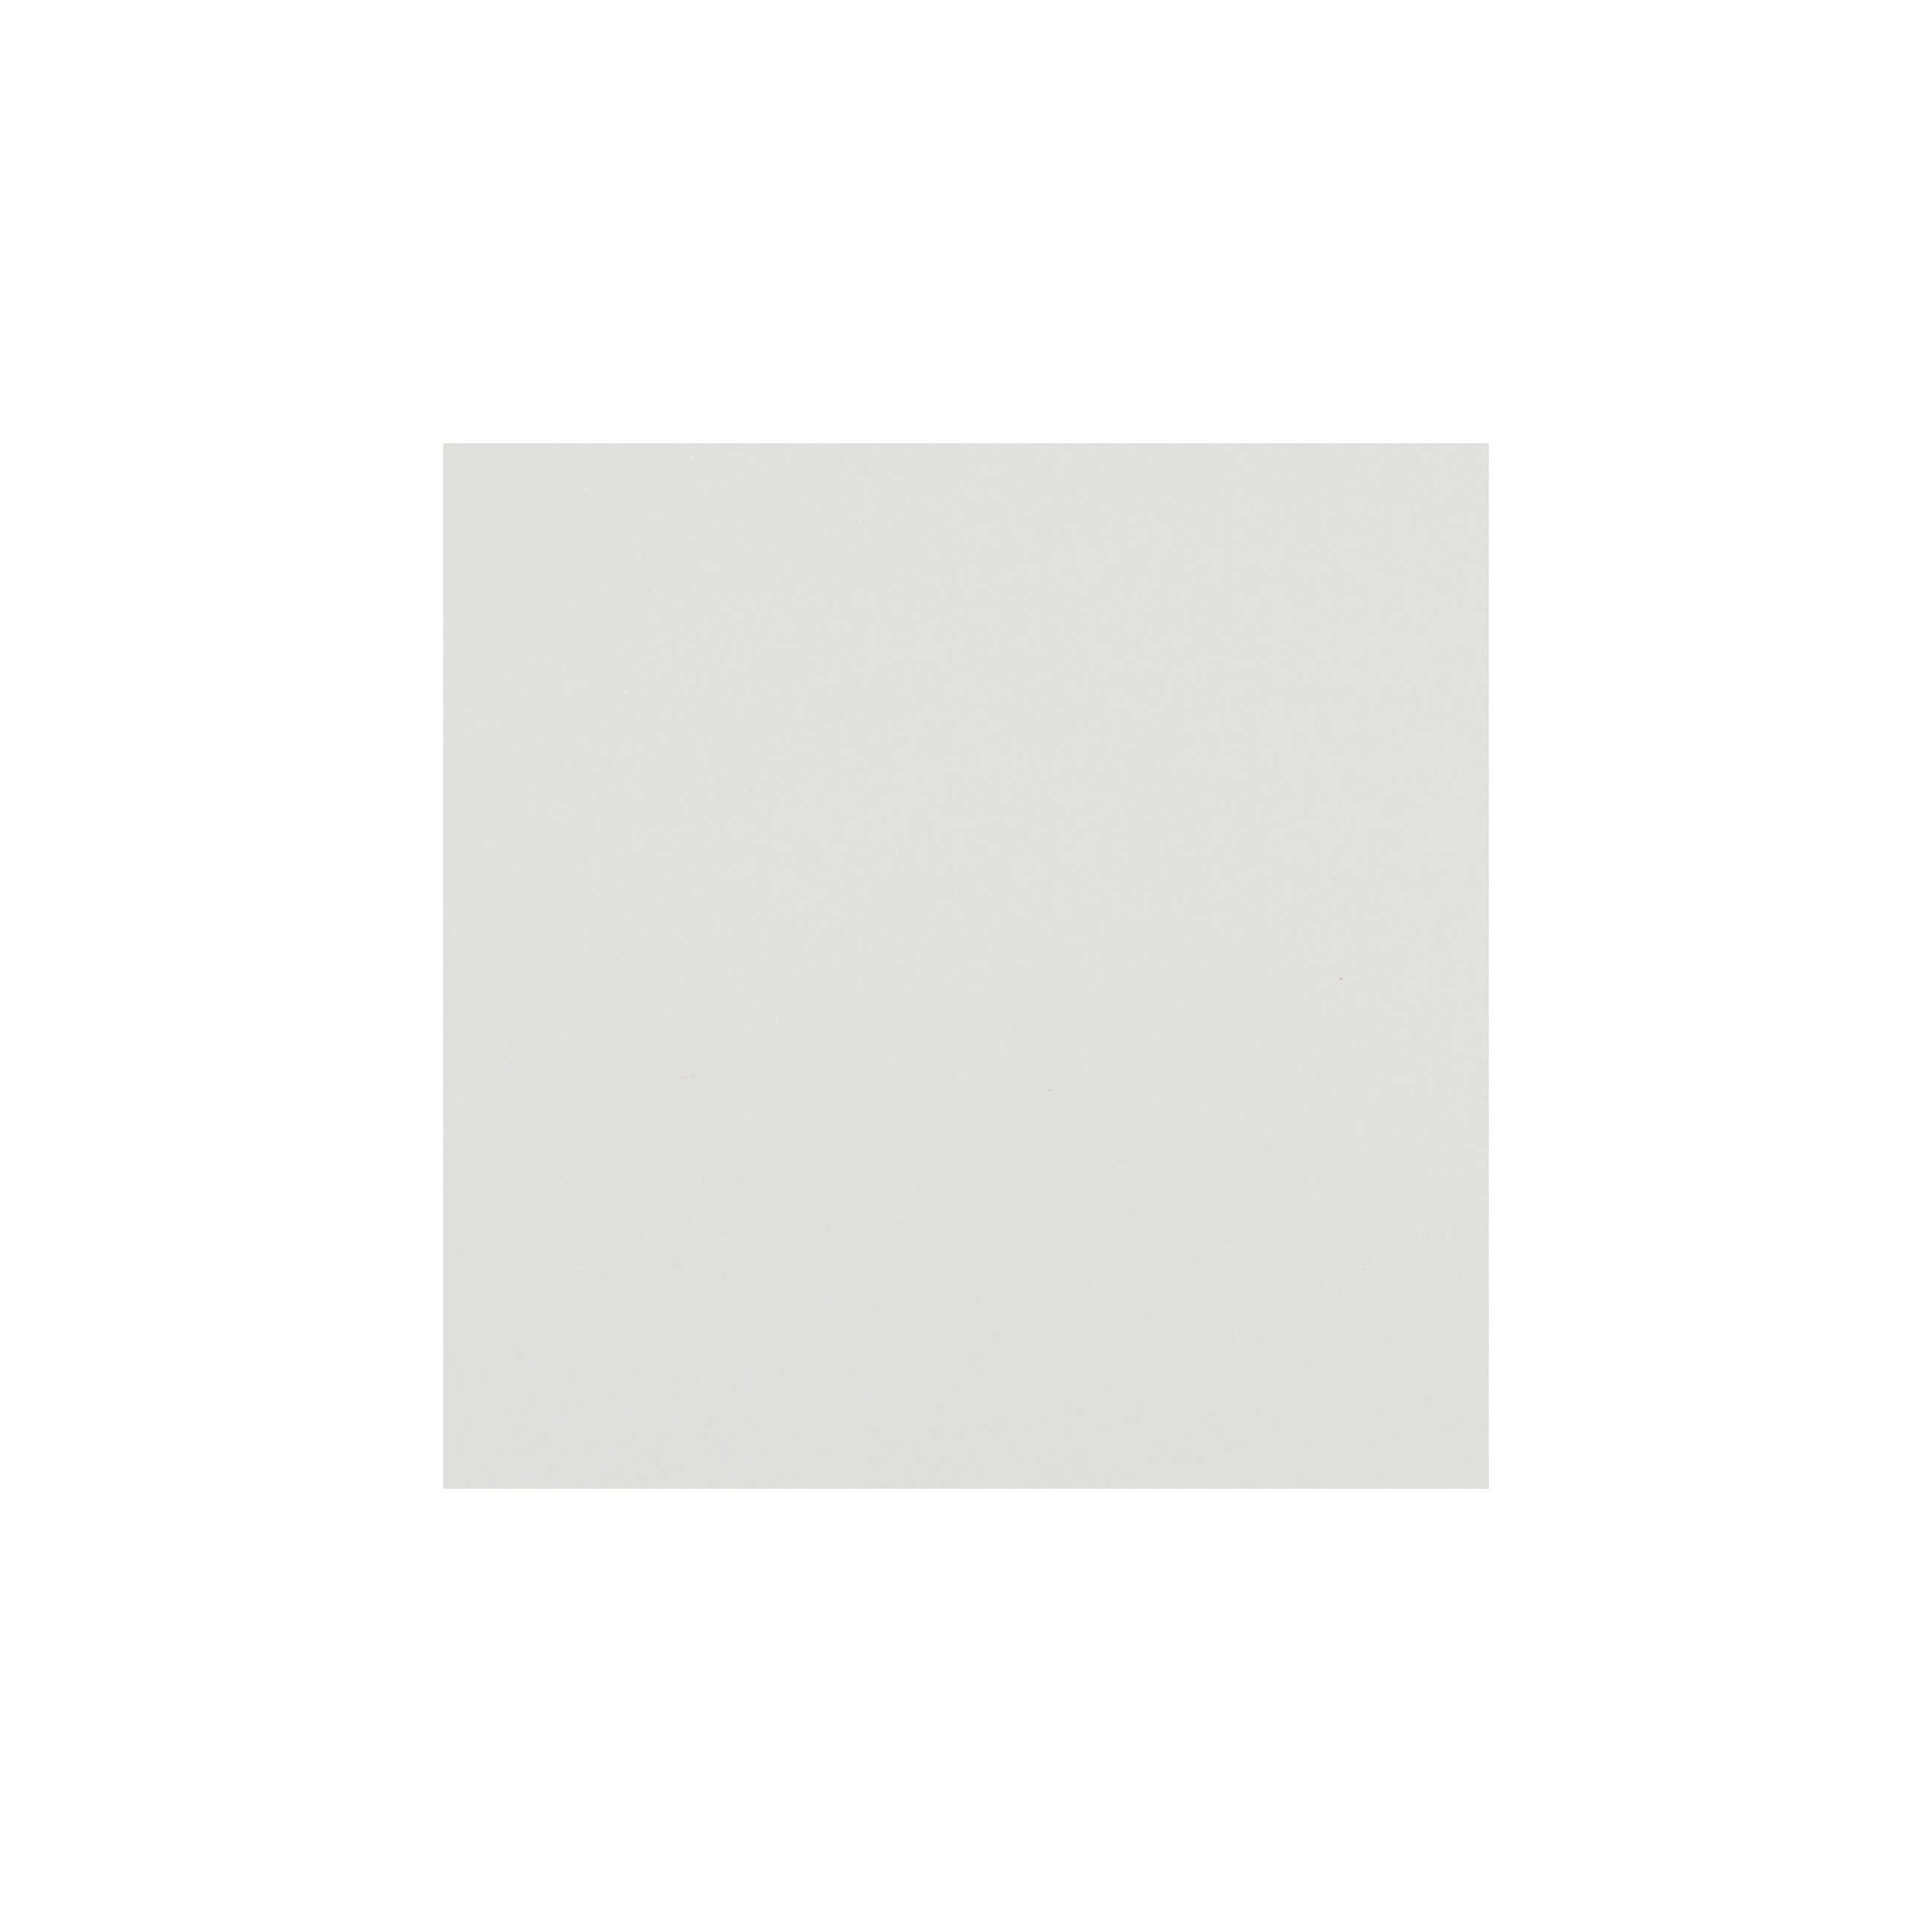 Cardstock 119mm Square - Ivory Sparkle